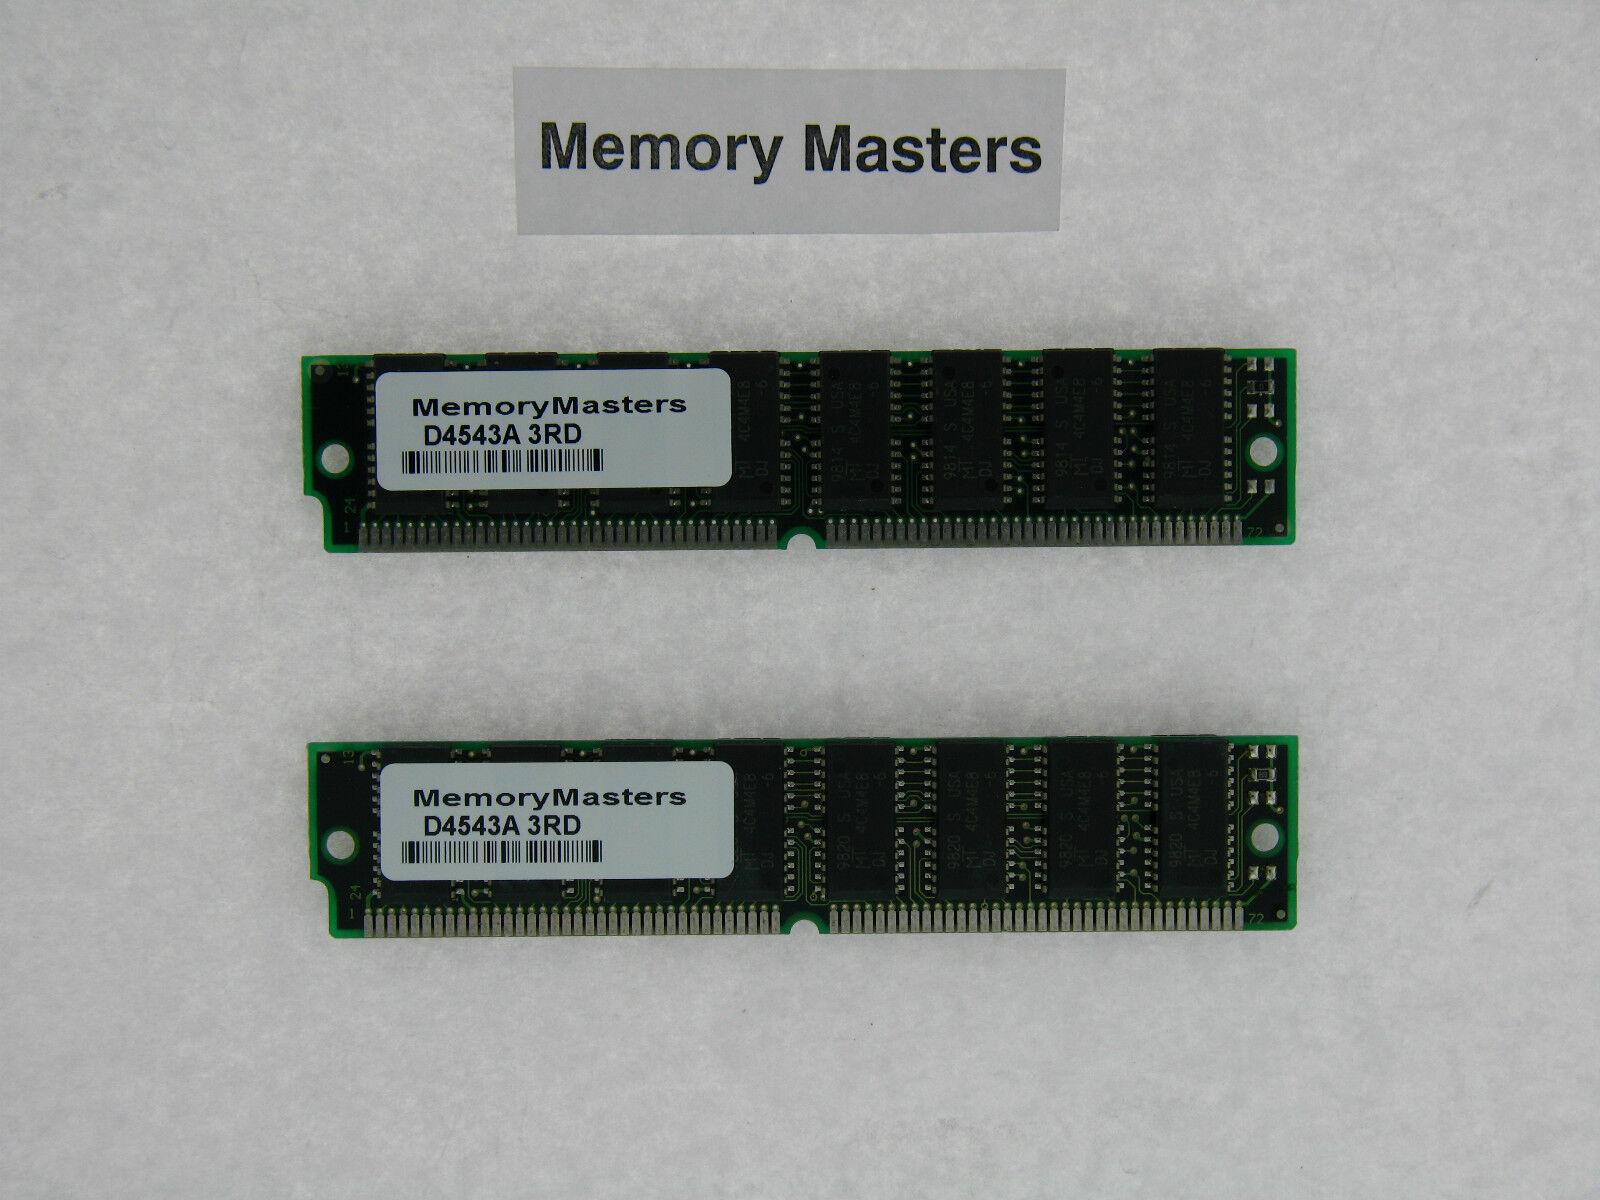 128MB 2x 64MB EDO DRAM SIMM 72p Memory RAM 72pin 16x4 ICs 60ns